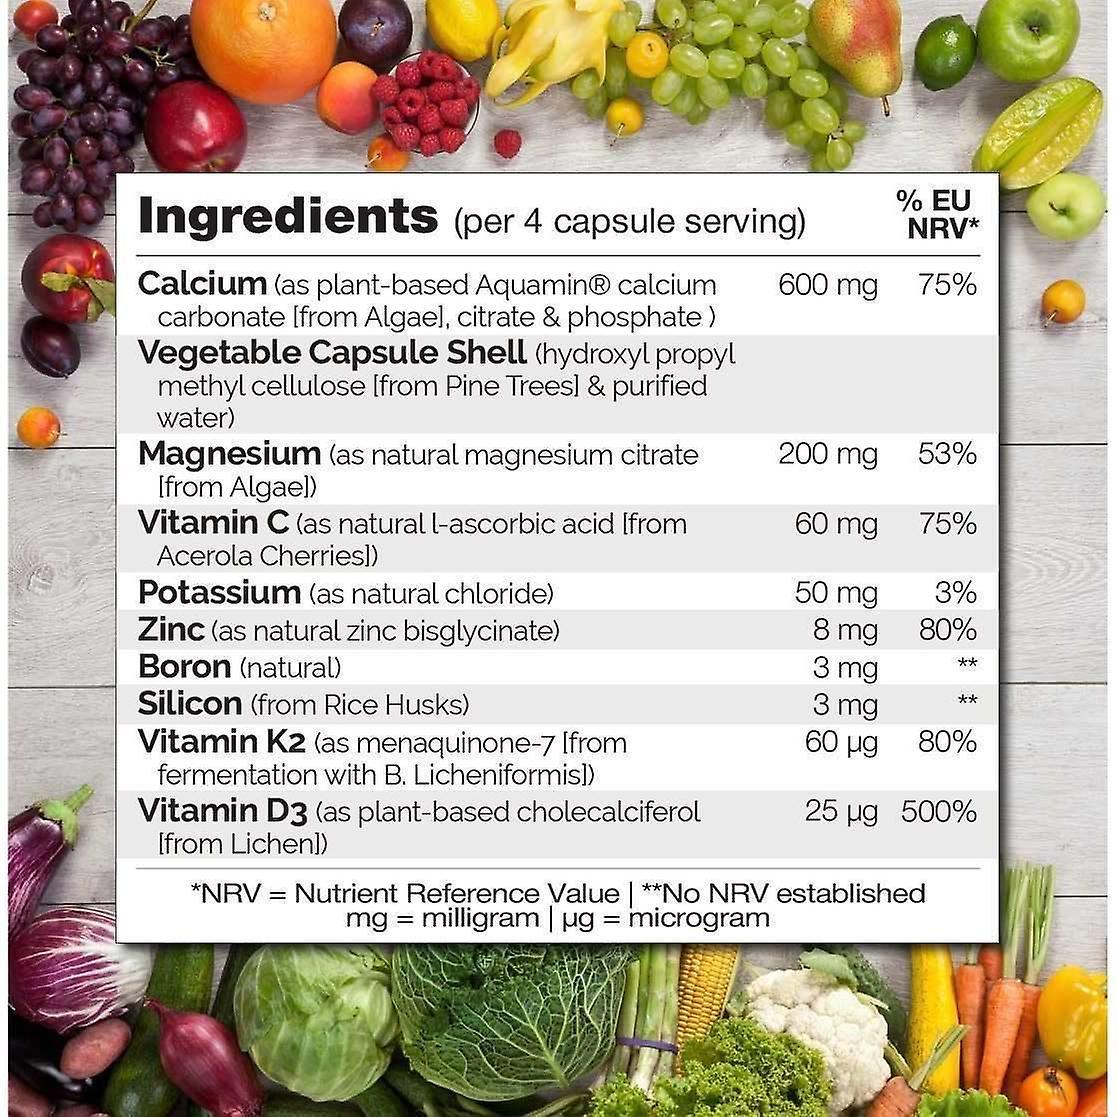 Bone styrke med naturlig kalsium, magnesium, vitamin c, D3, & K2-120 caps | 1 måned forsyning (vegan)